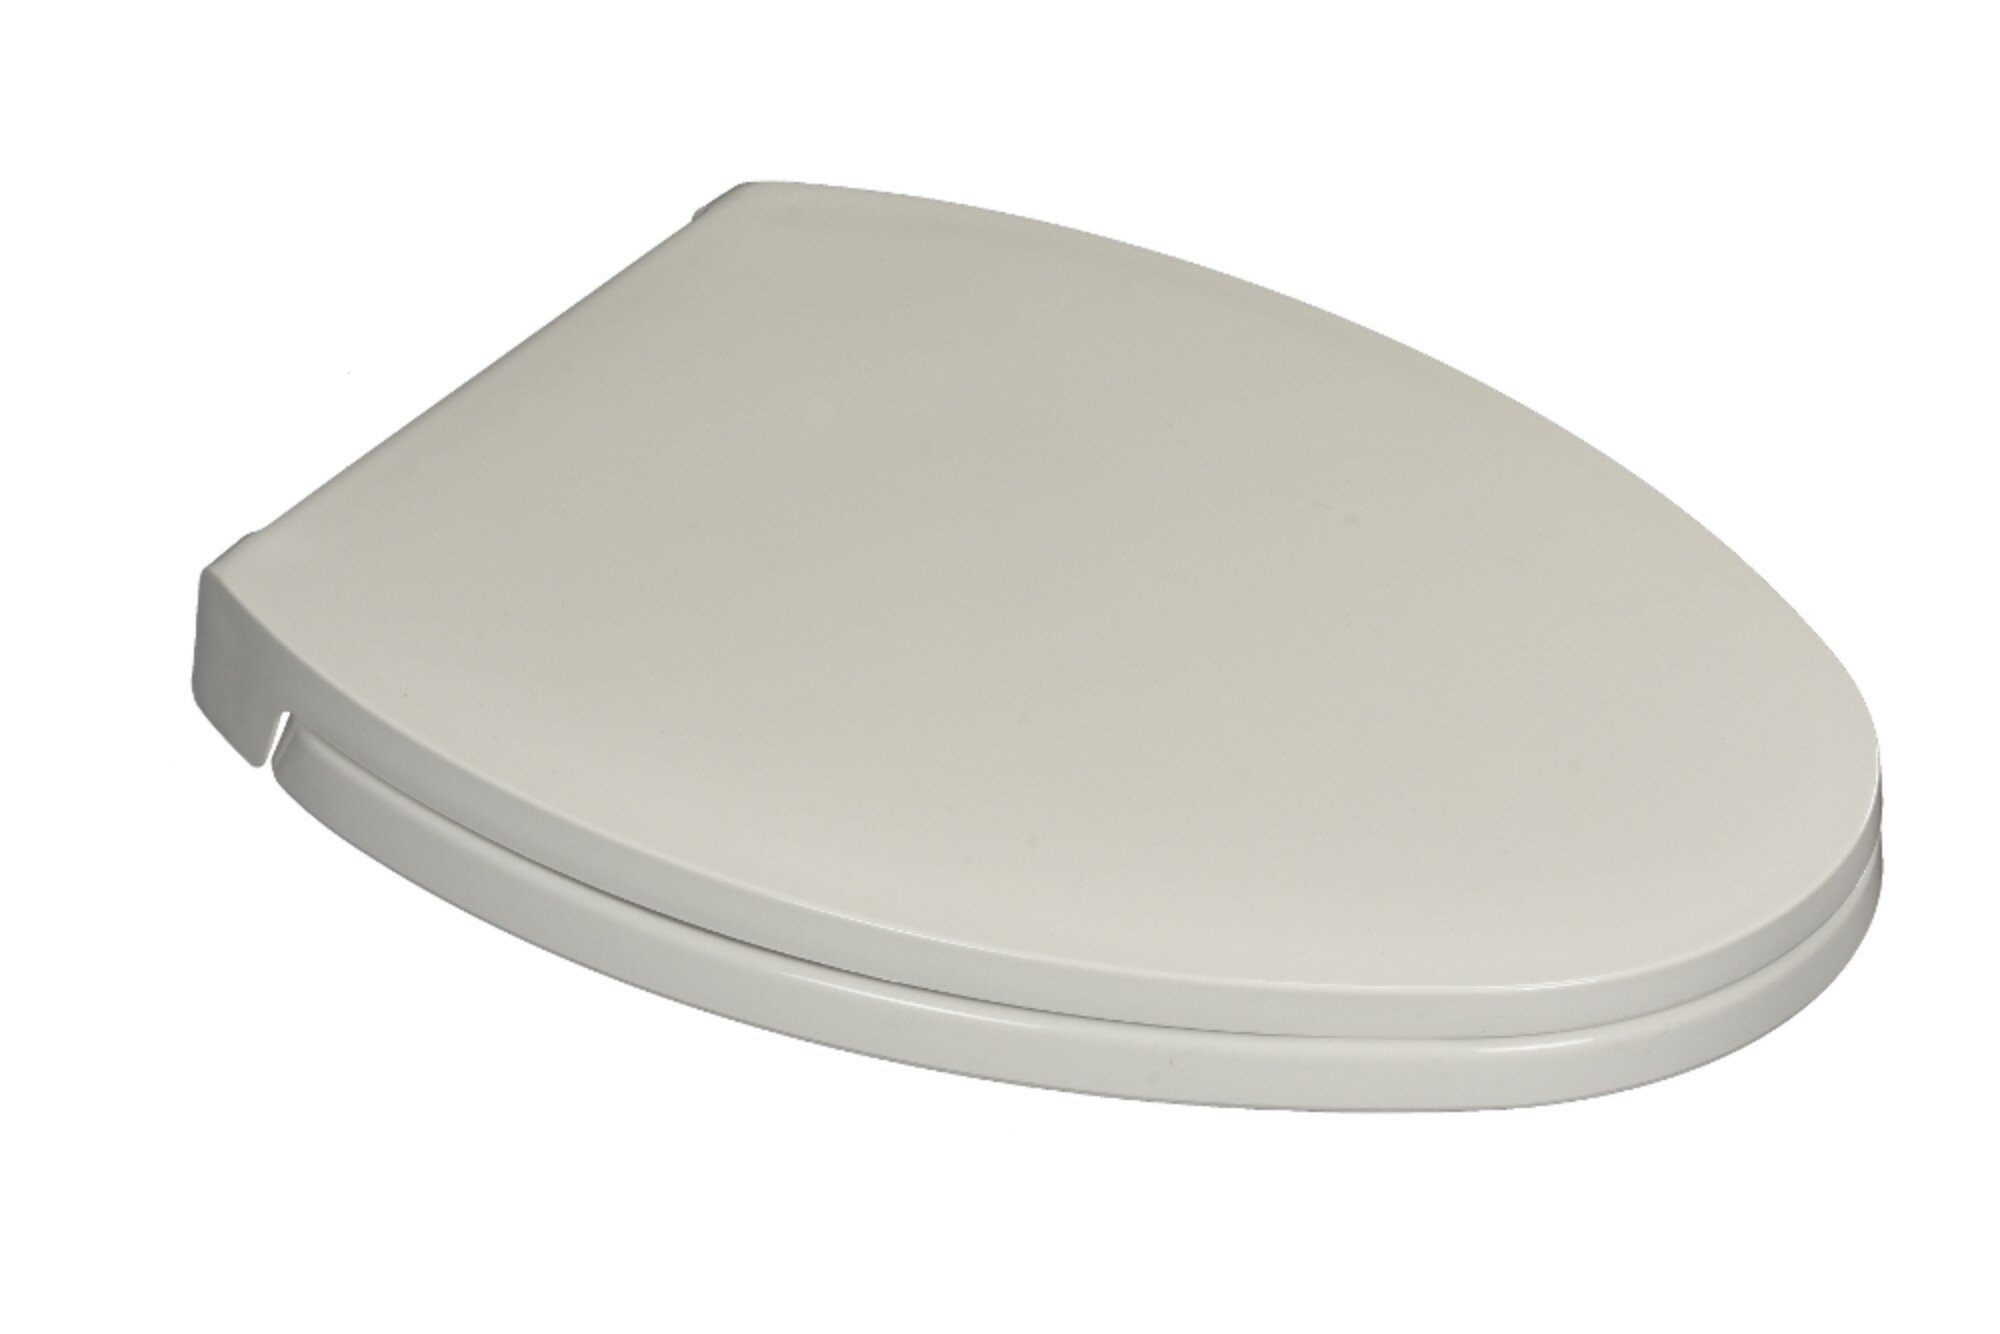 Admirable Luxury Elongated Toilet Seat Evergreenethics Interior Chair Design Evergreenethicsorg